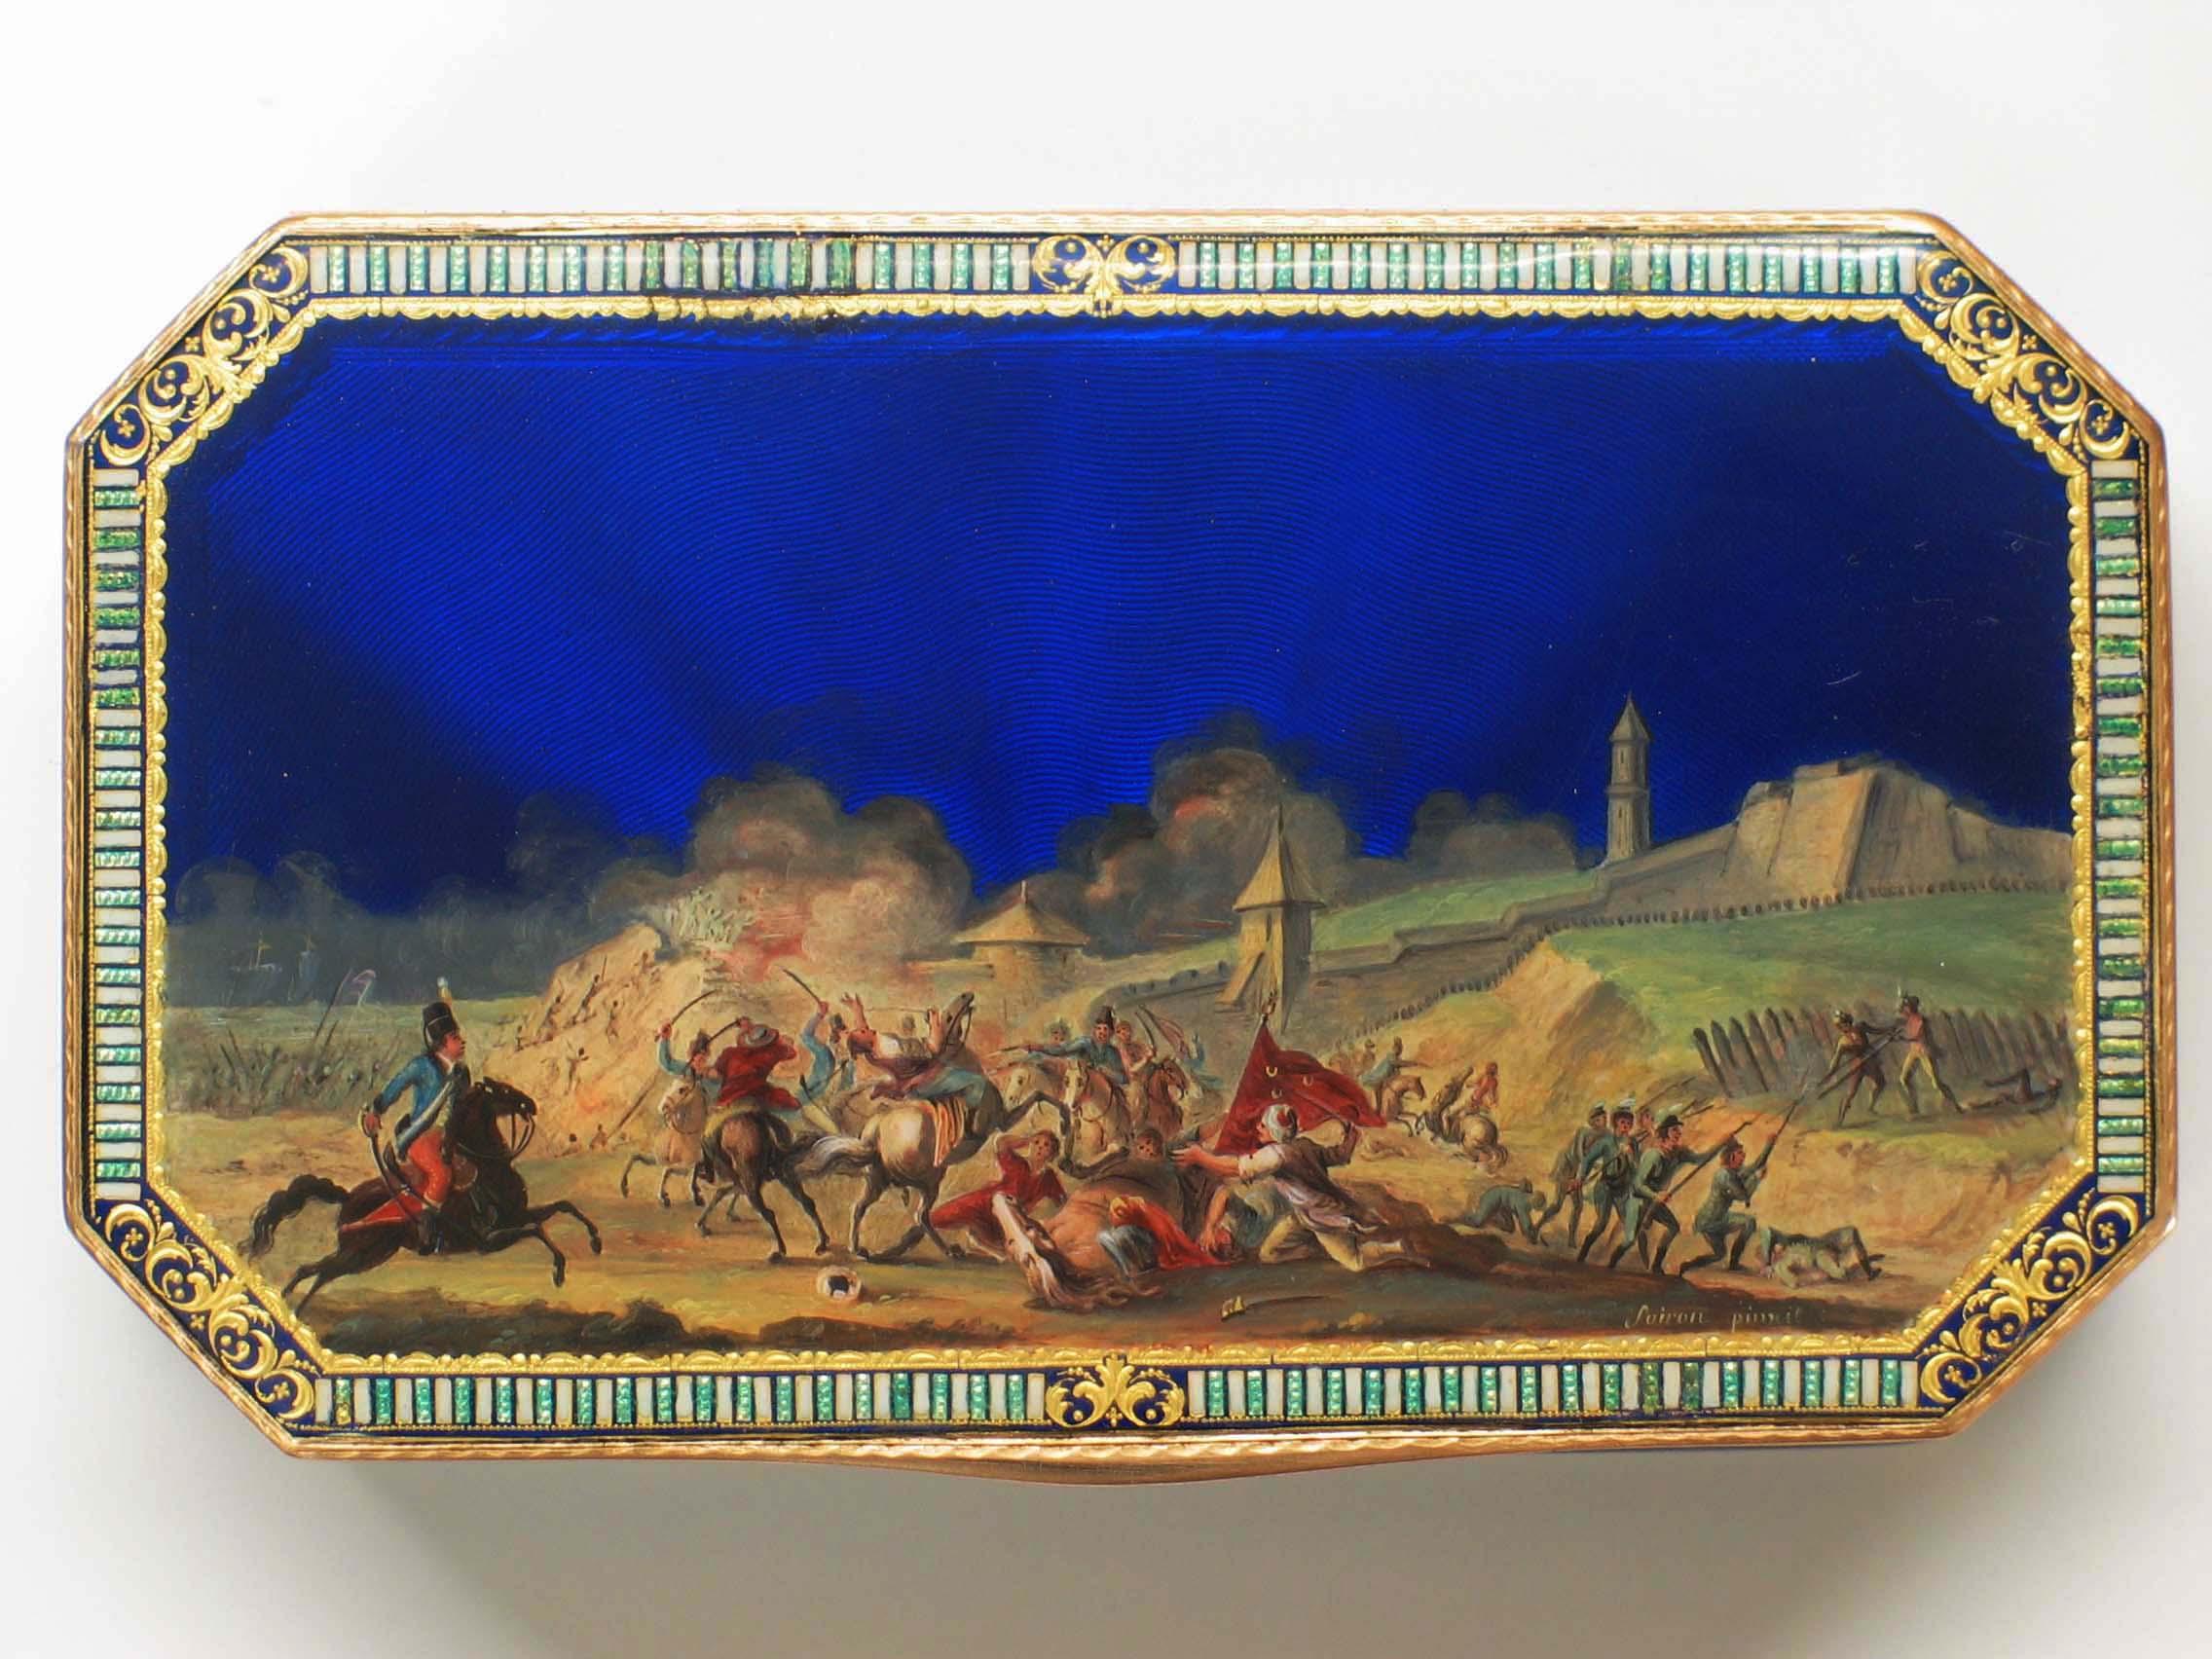 Enamel on Gold Box. France, circa 1800